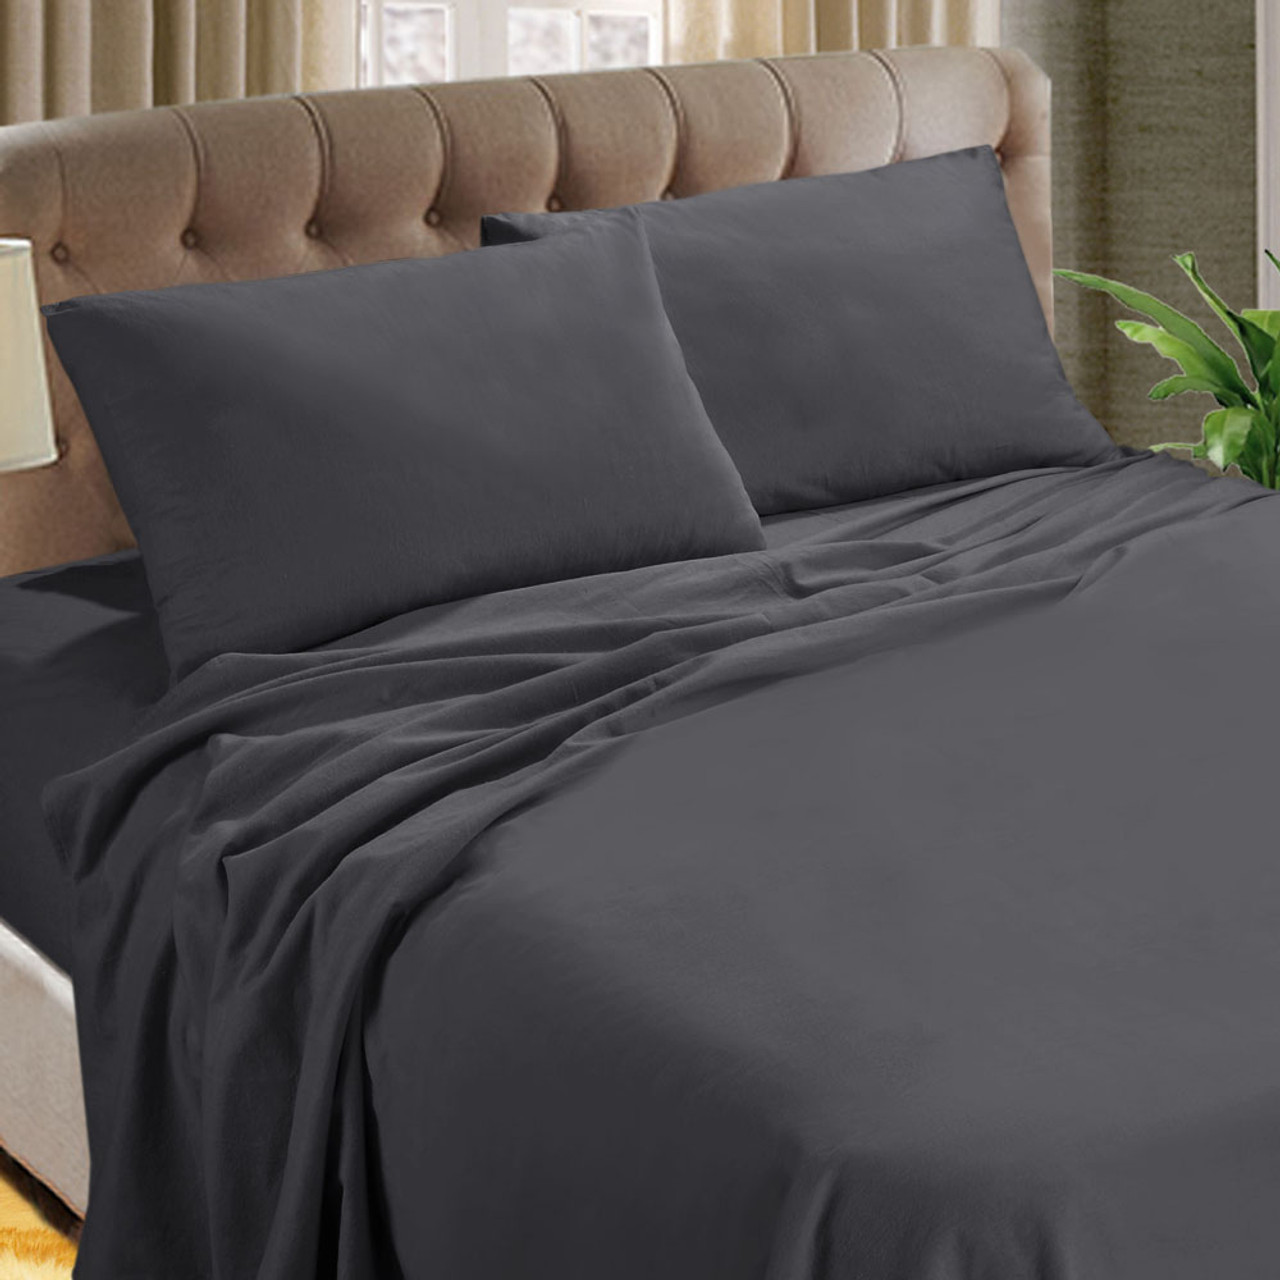 Kingtex Micro Flannel 40cm Sheet Set Charcoal Double Bed My Linen